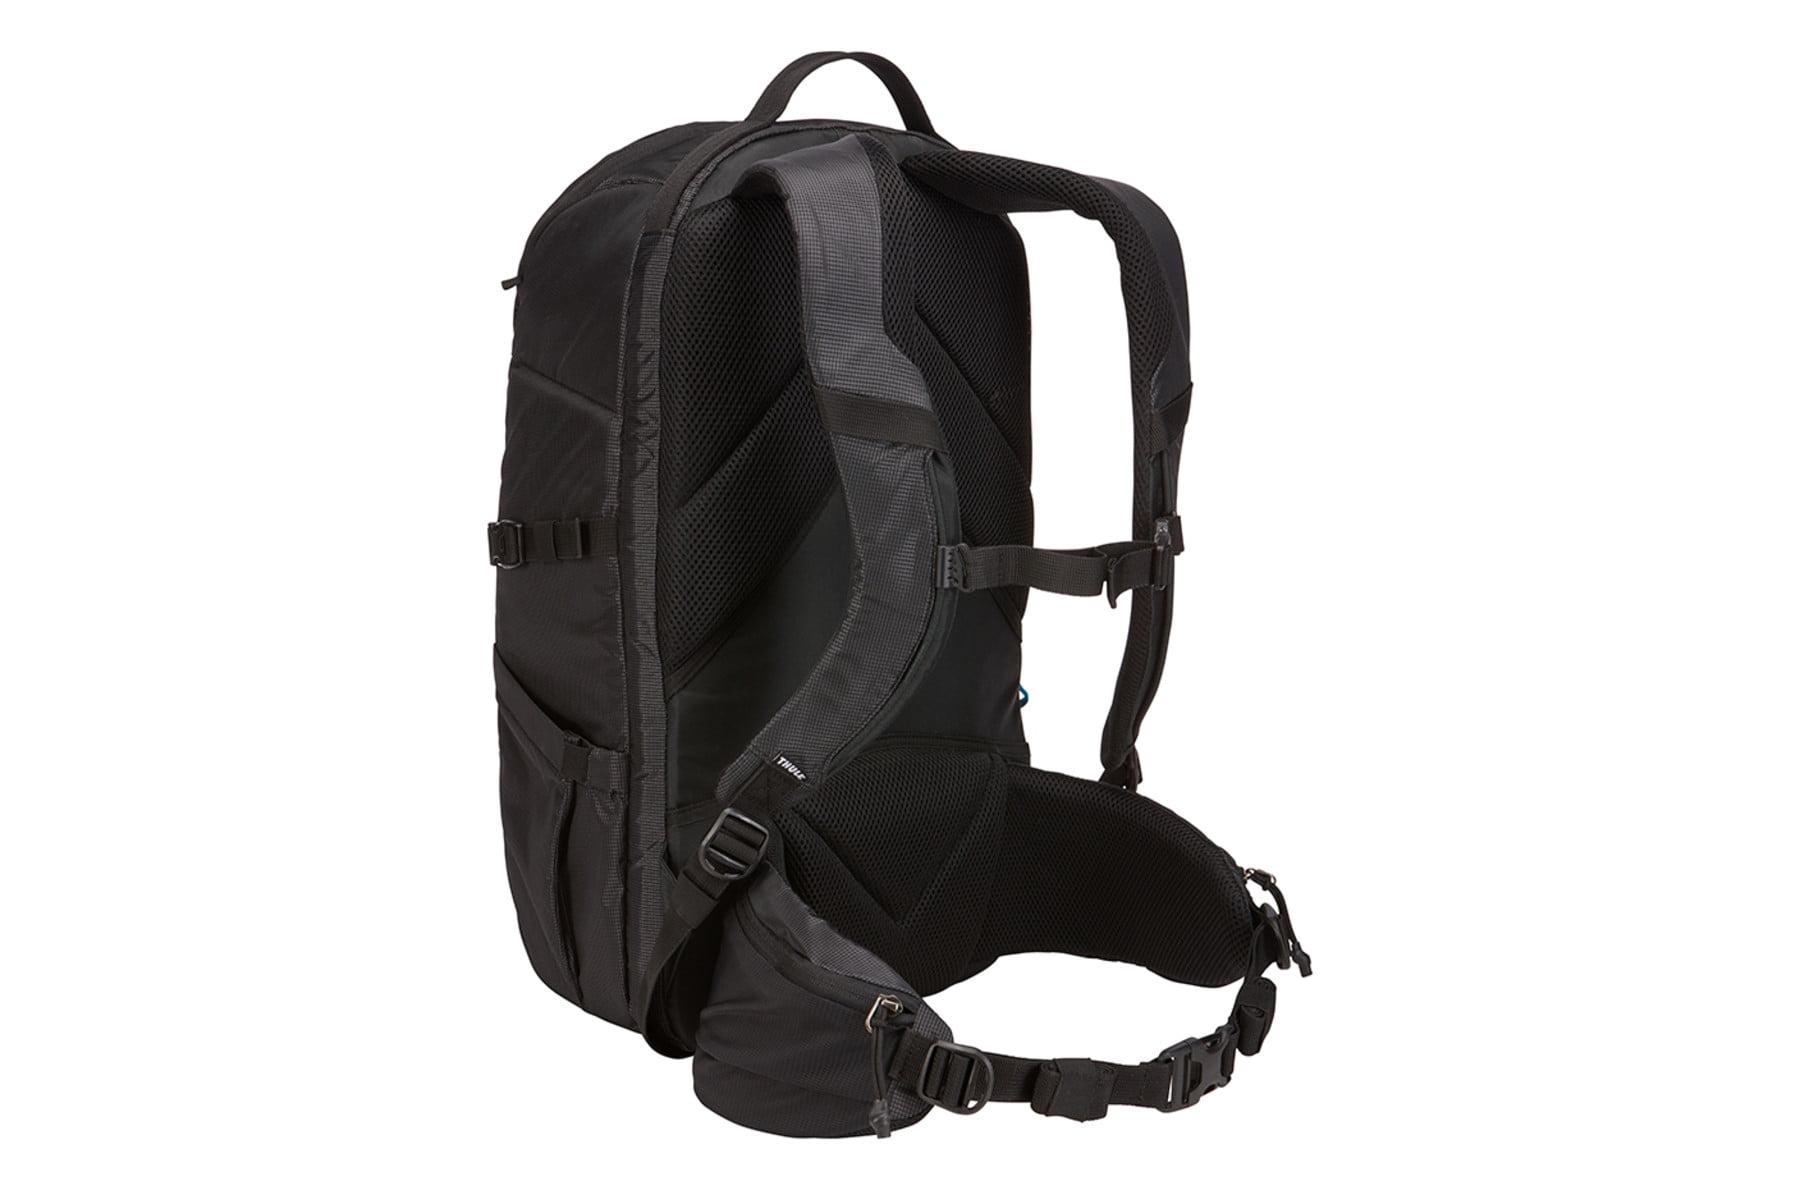 Rucsac foto Thule Aspect DSLR Backpack Negru 2